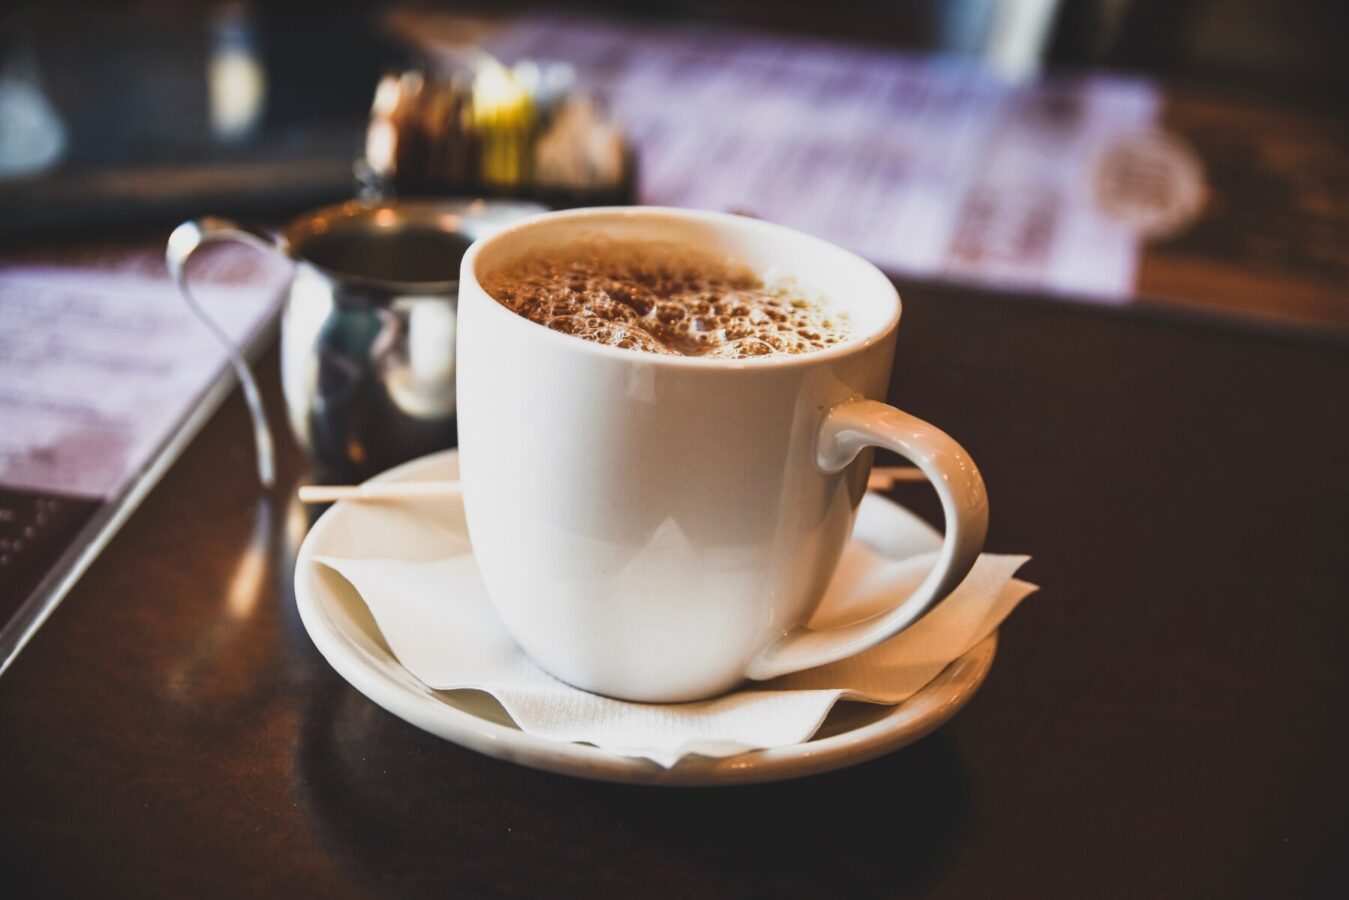 Killington coffee house coffee on the counter